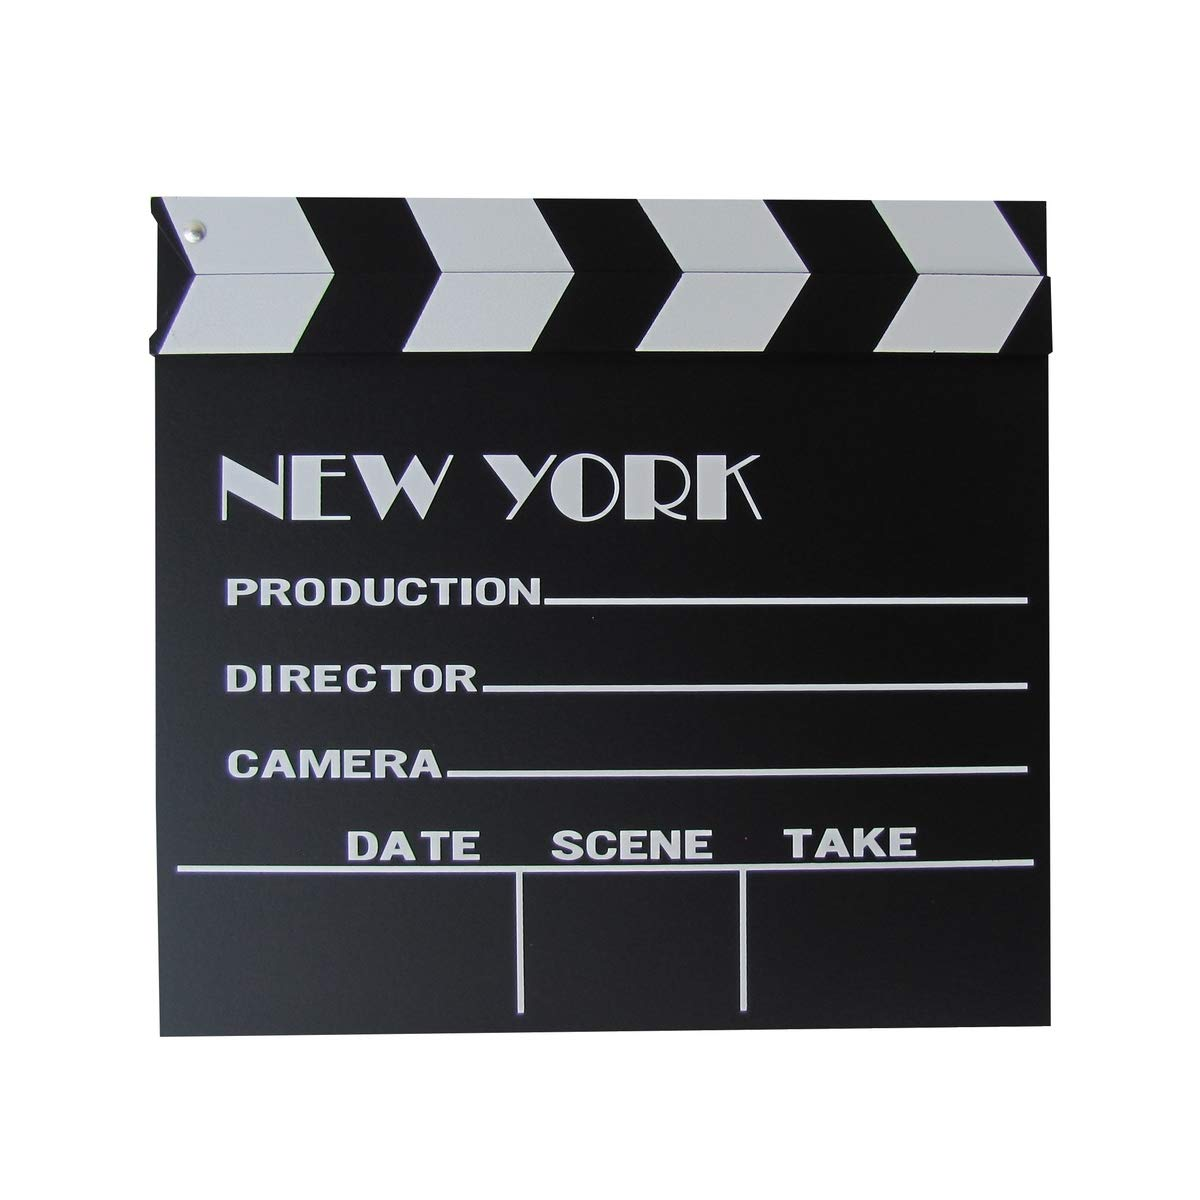 New York, NY Movie Studio Set Action Clapboard Film Recording Clapper Board Prop